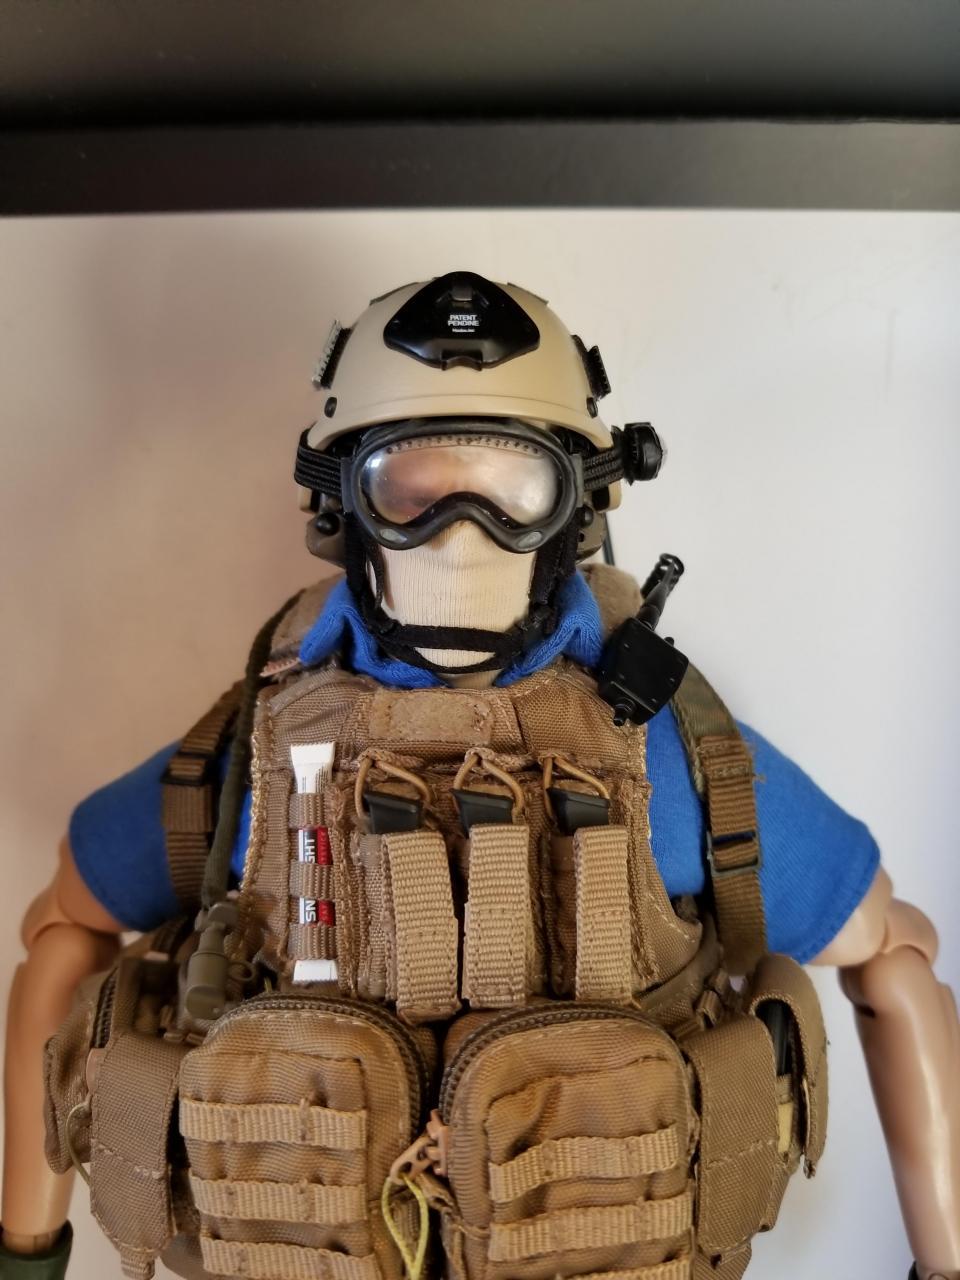 Modern Warfare 2 - Task Force 141 operative in urban wear (pic heavy)-4_-_dayl8uo[1]-jpg